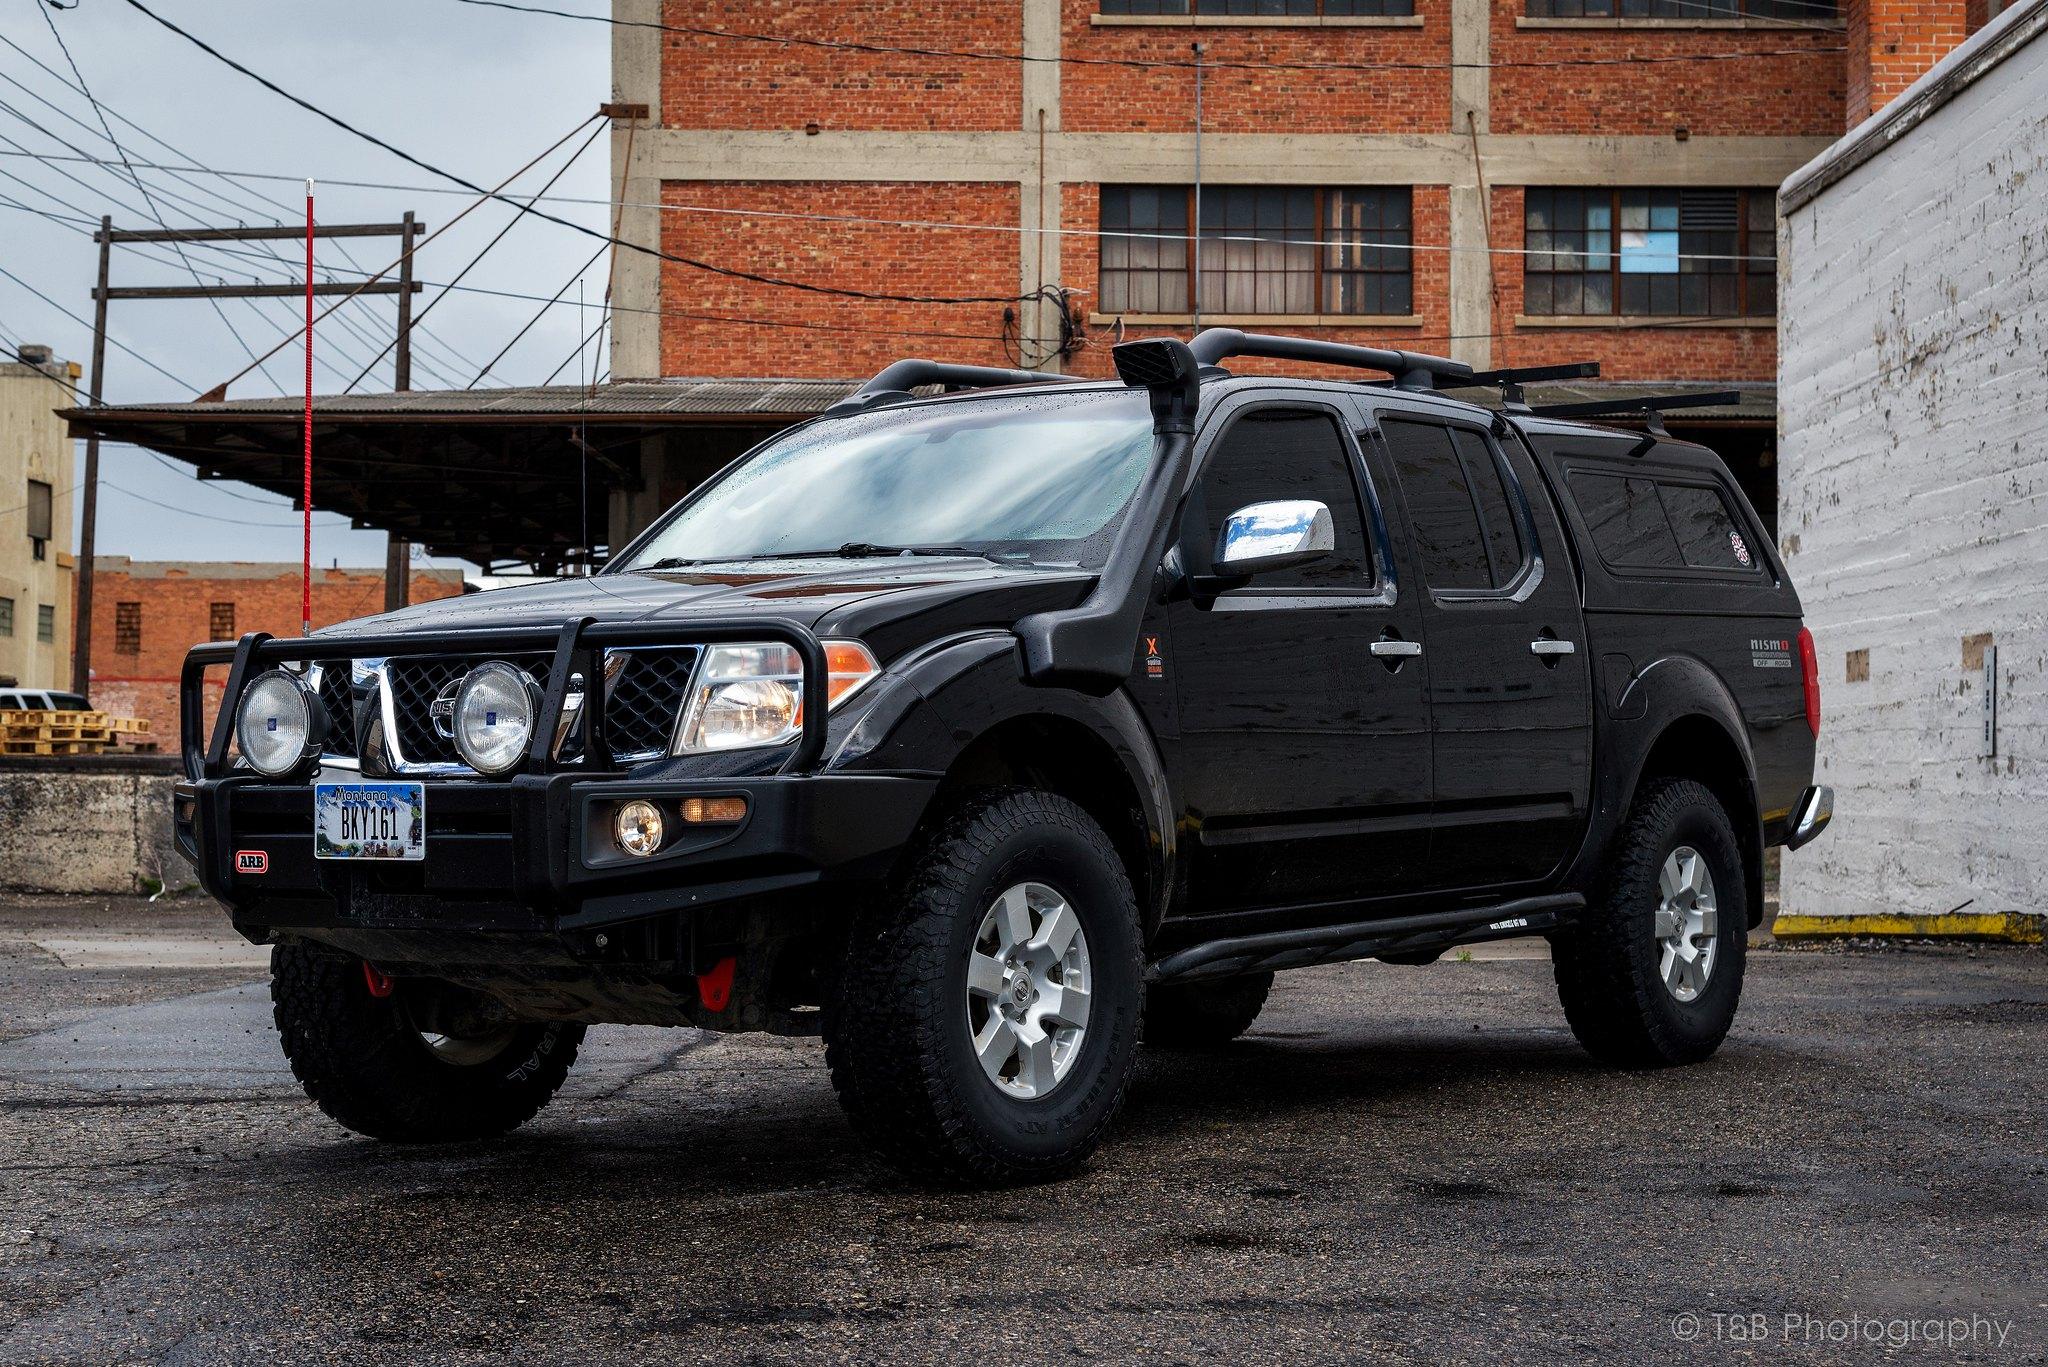 2002 Nissan Xterra Lift Kit >> October Truck of the Month - WreckDiver1321 - Nissan ...